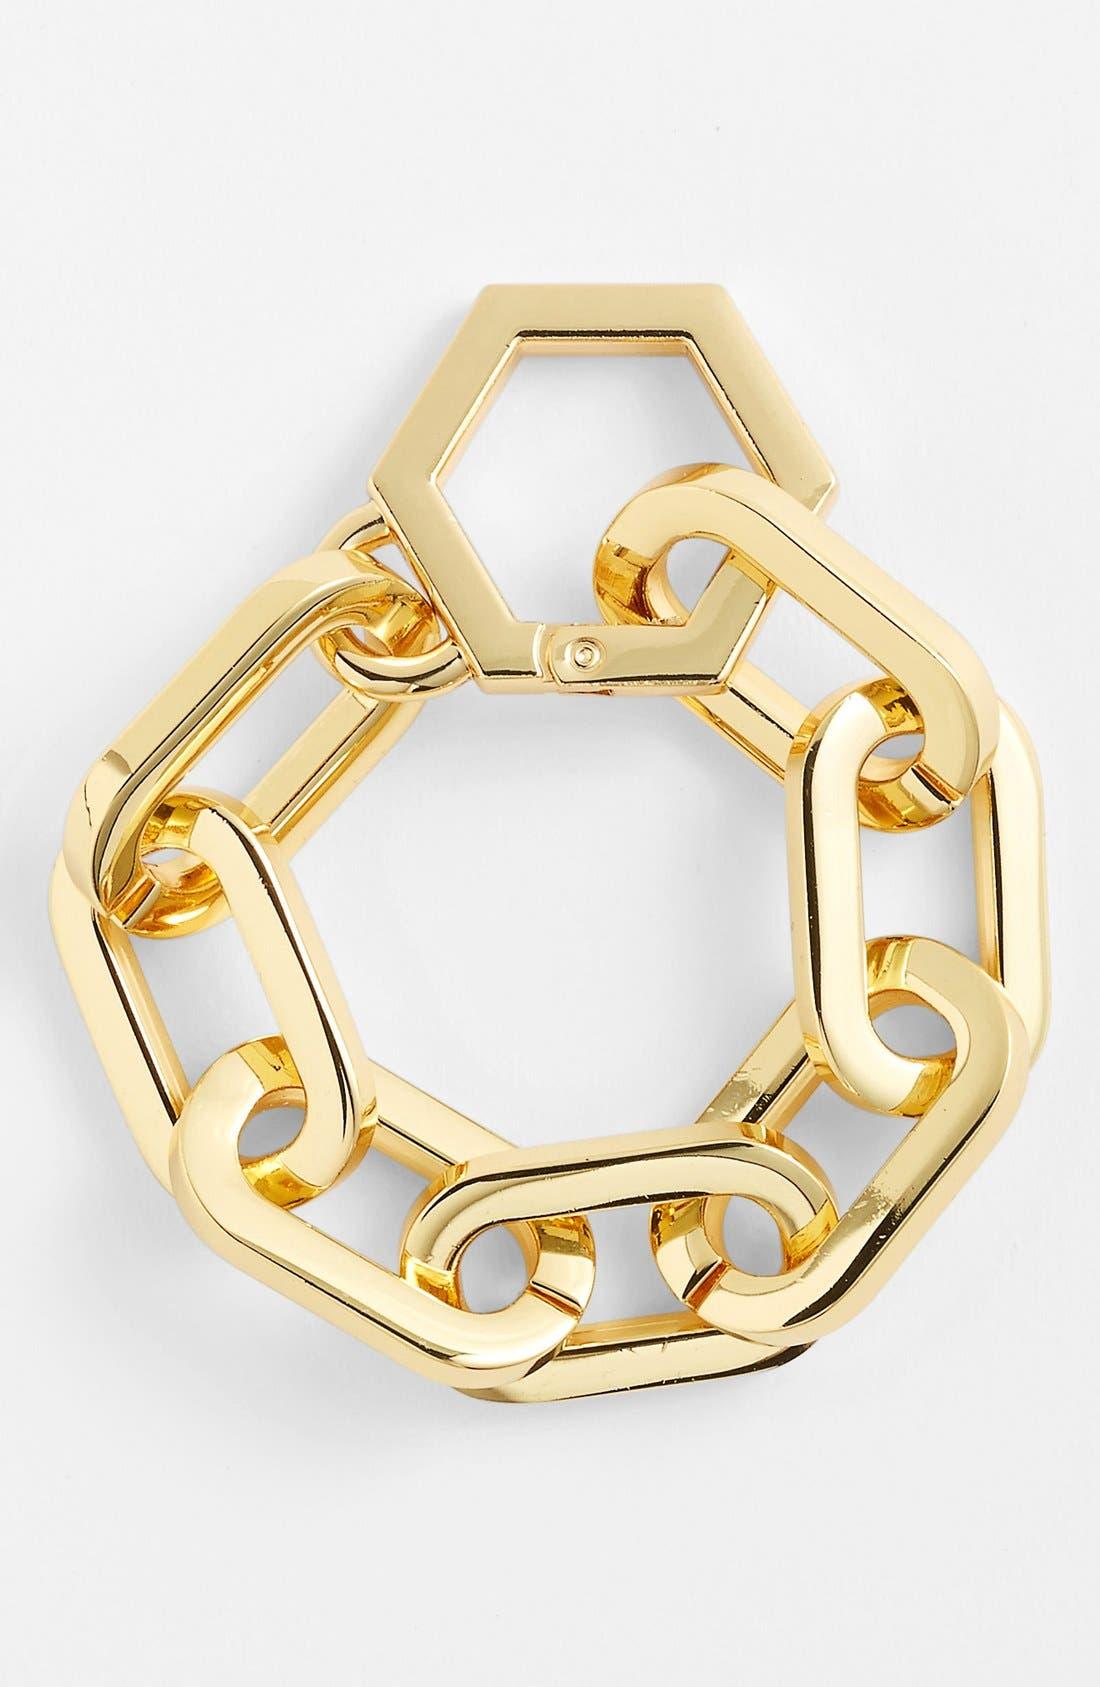 Main Image - Tory Burch 'Heidi' Chunky Link Bracelet